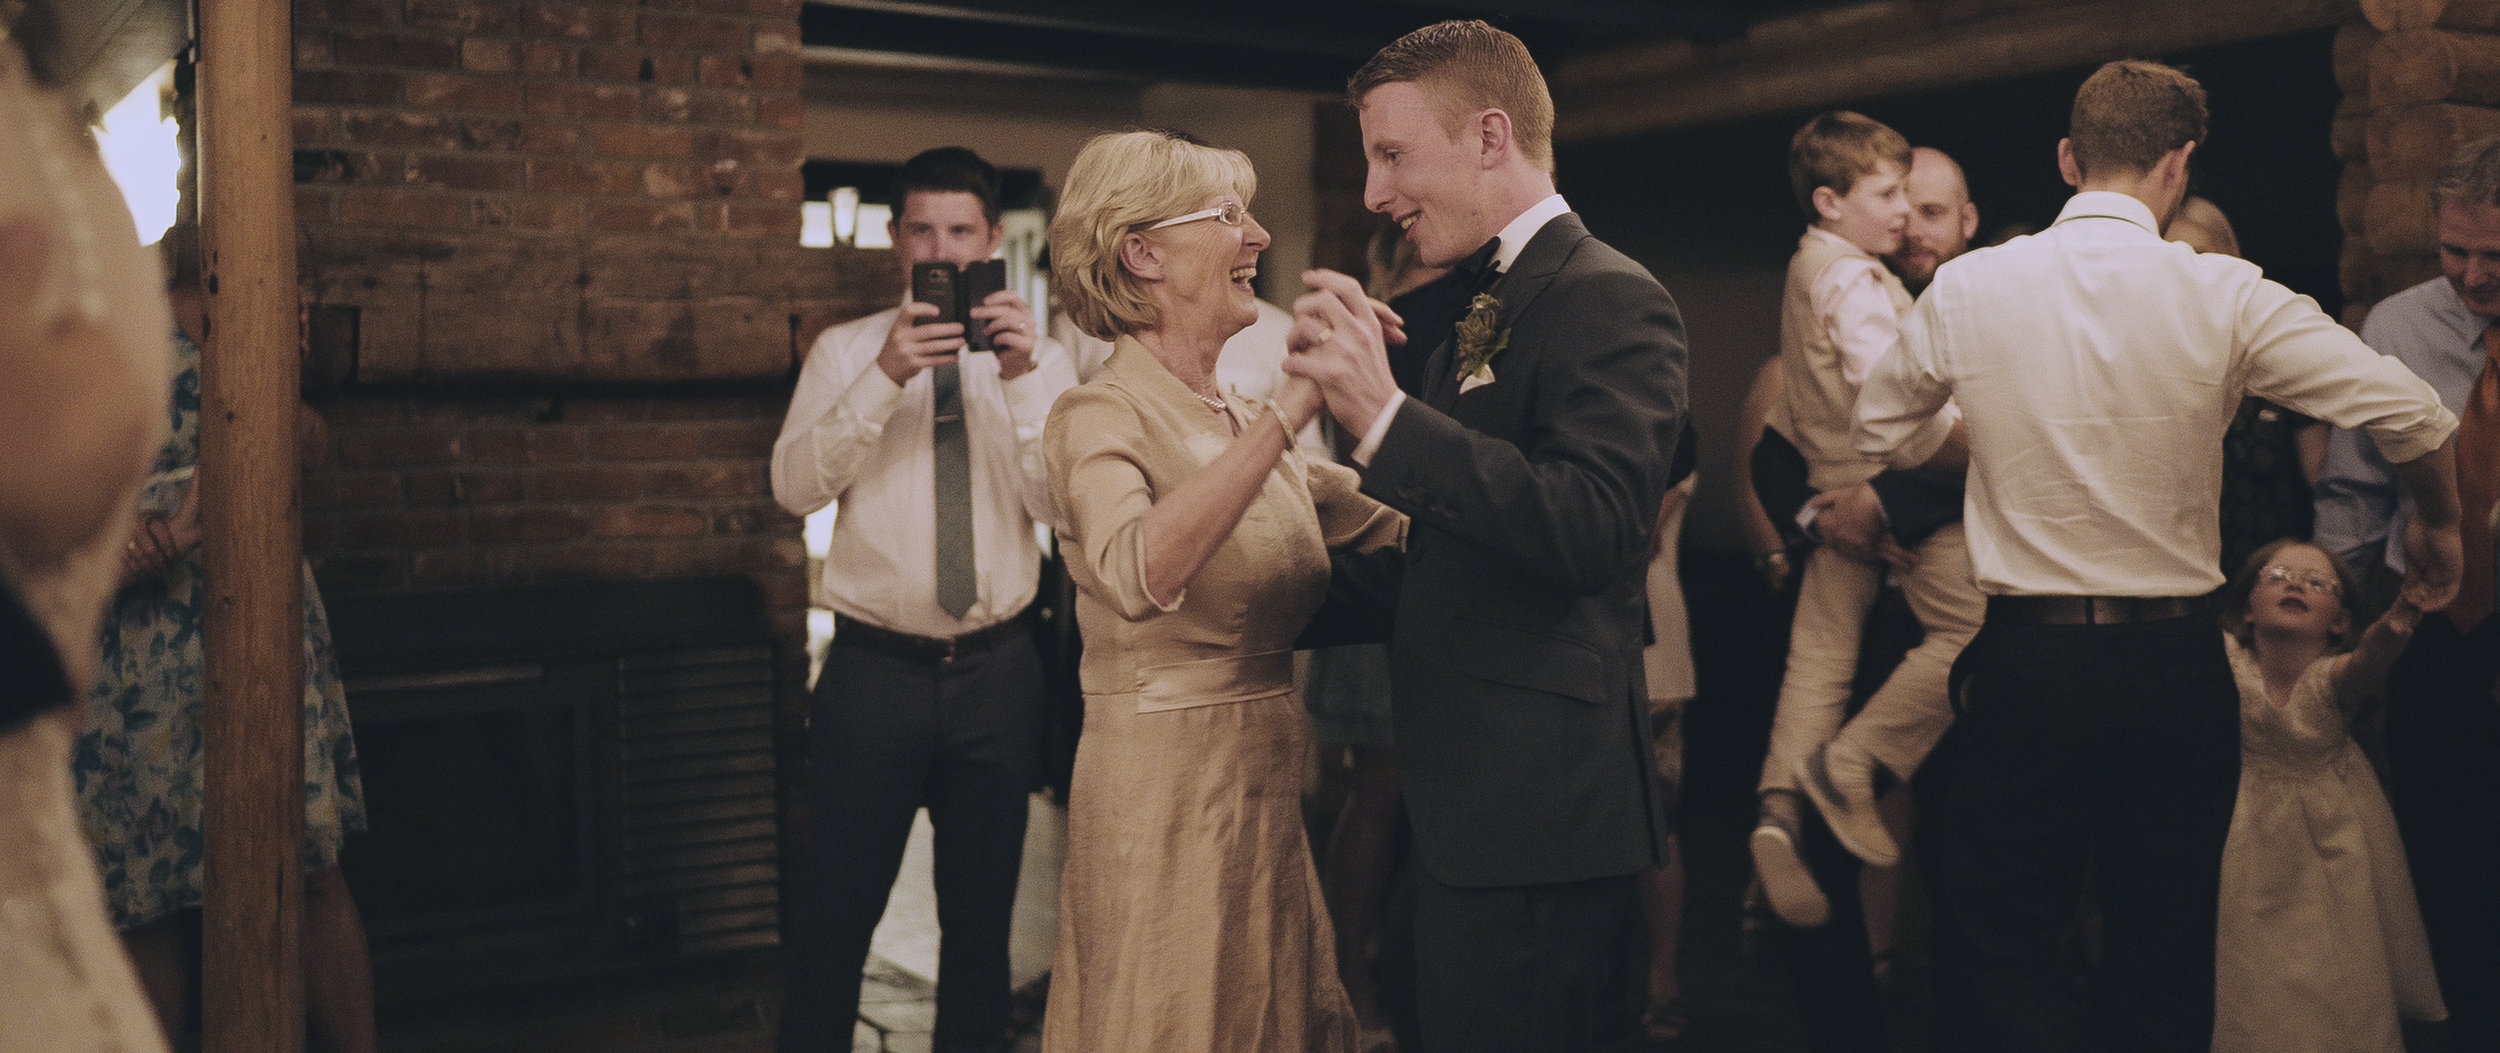 BC Wedding Videography-4.jpg